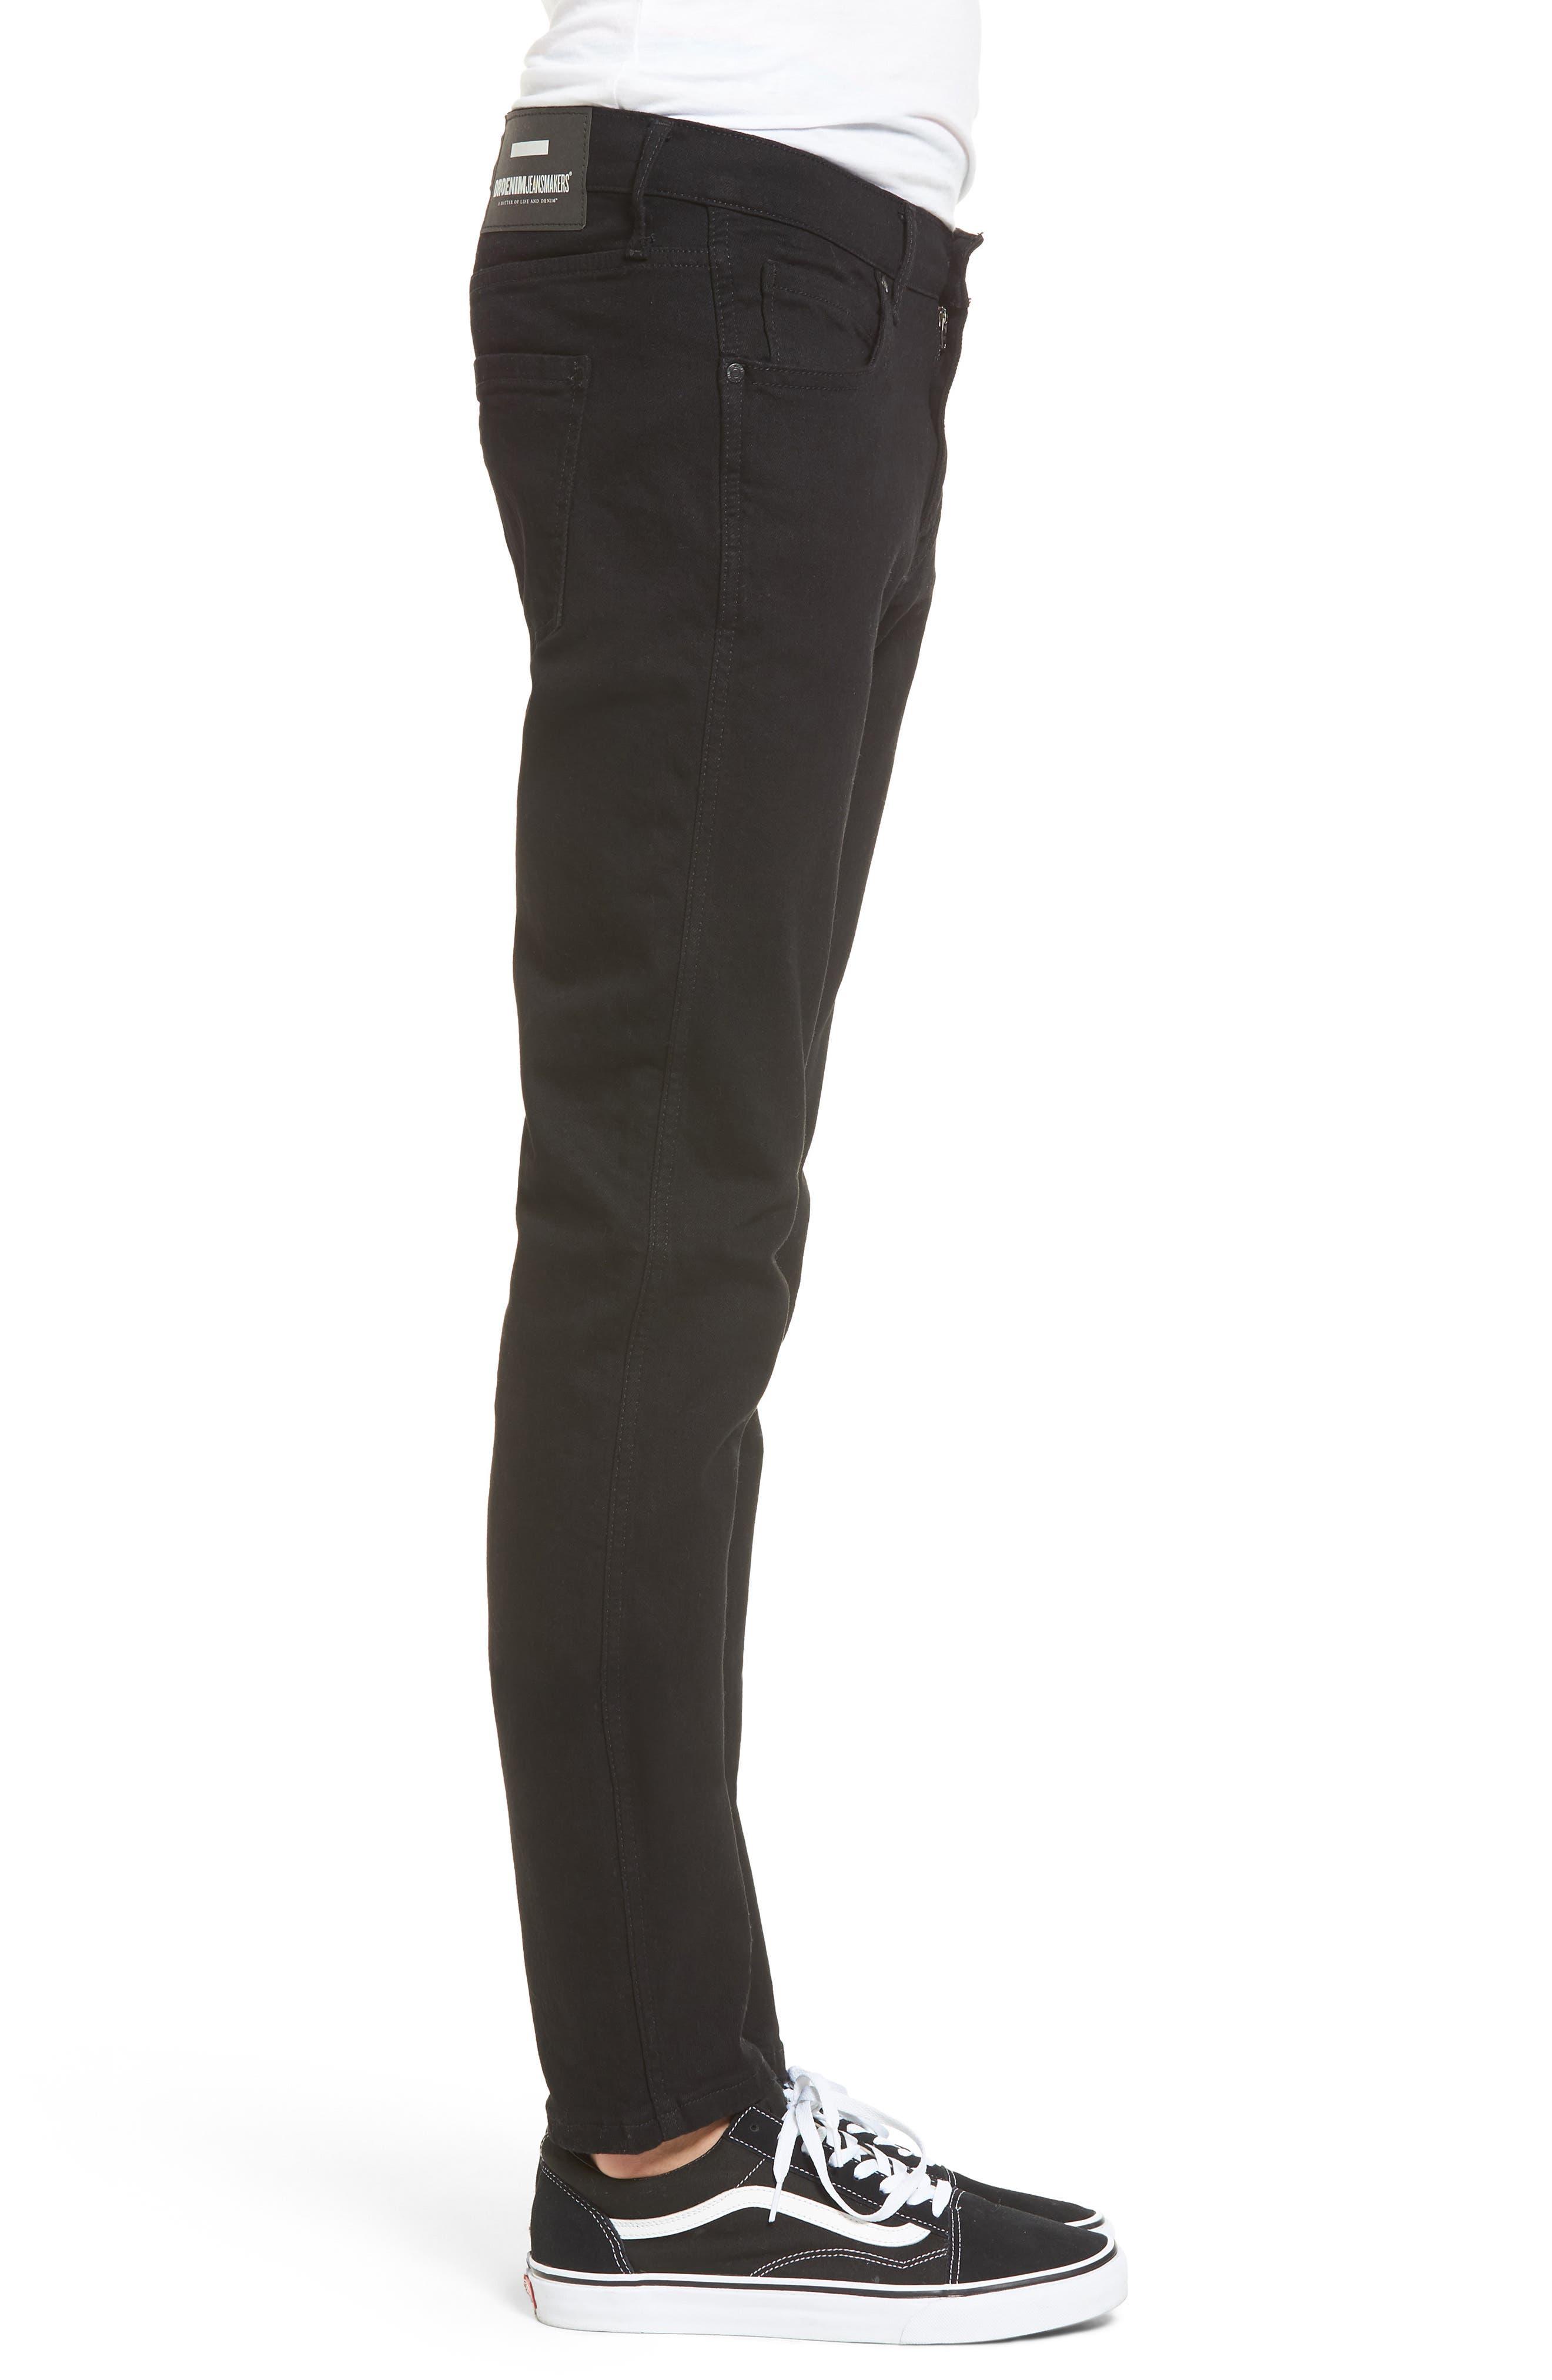 Snap Skinny Fit Jeans,                             Alternate thumbnail 3, color,                             Organic Black